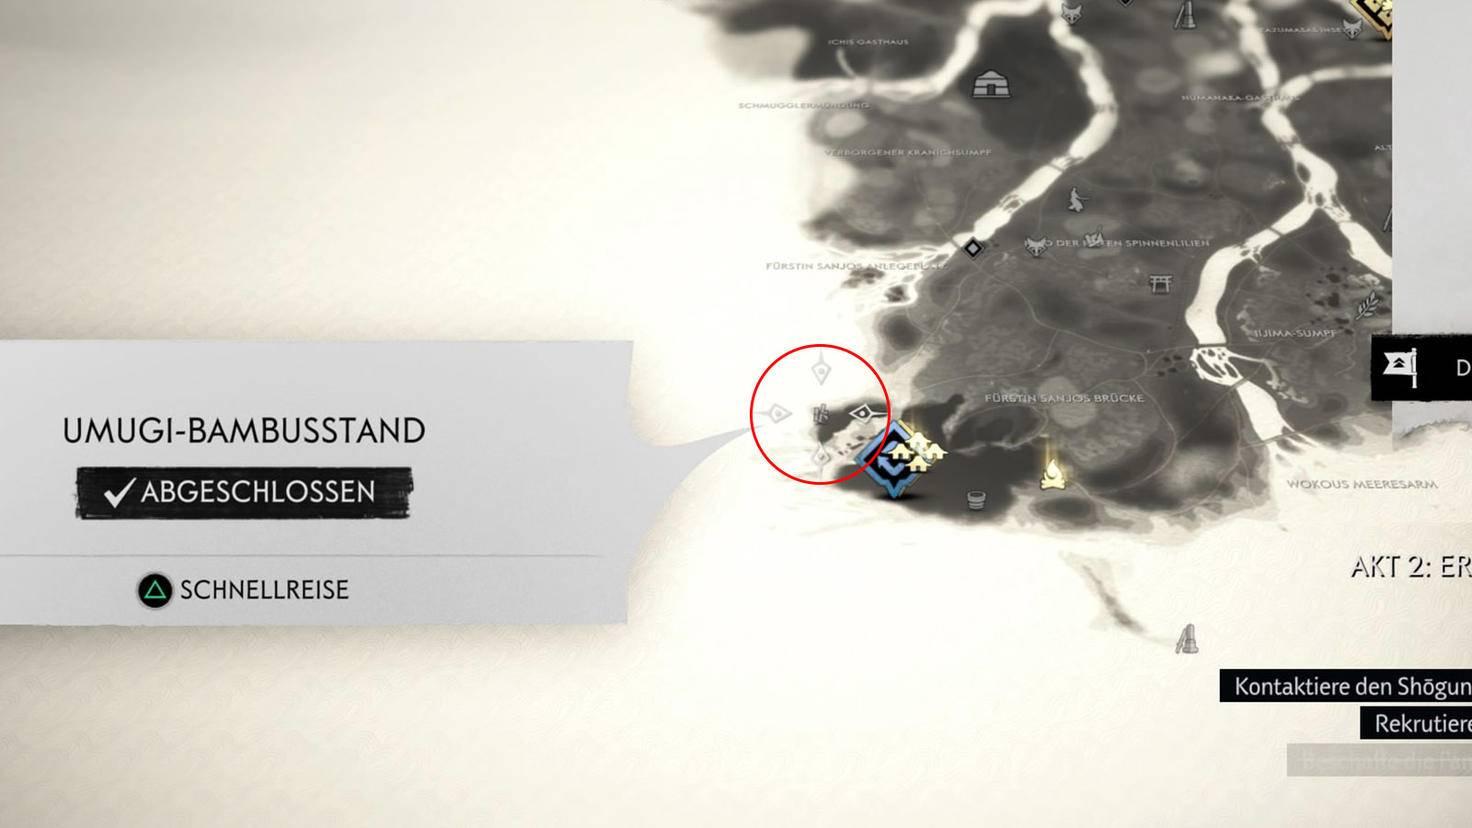 Ghost of Tsushima Karte